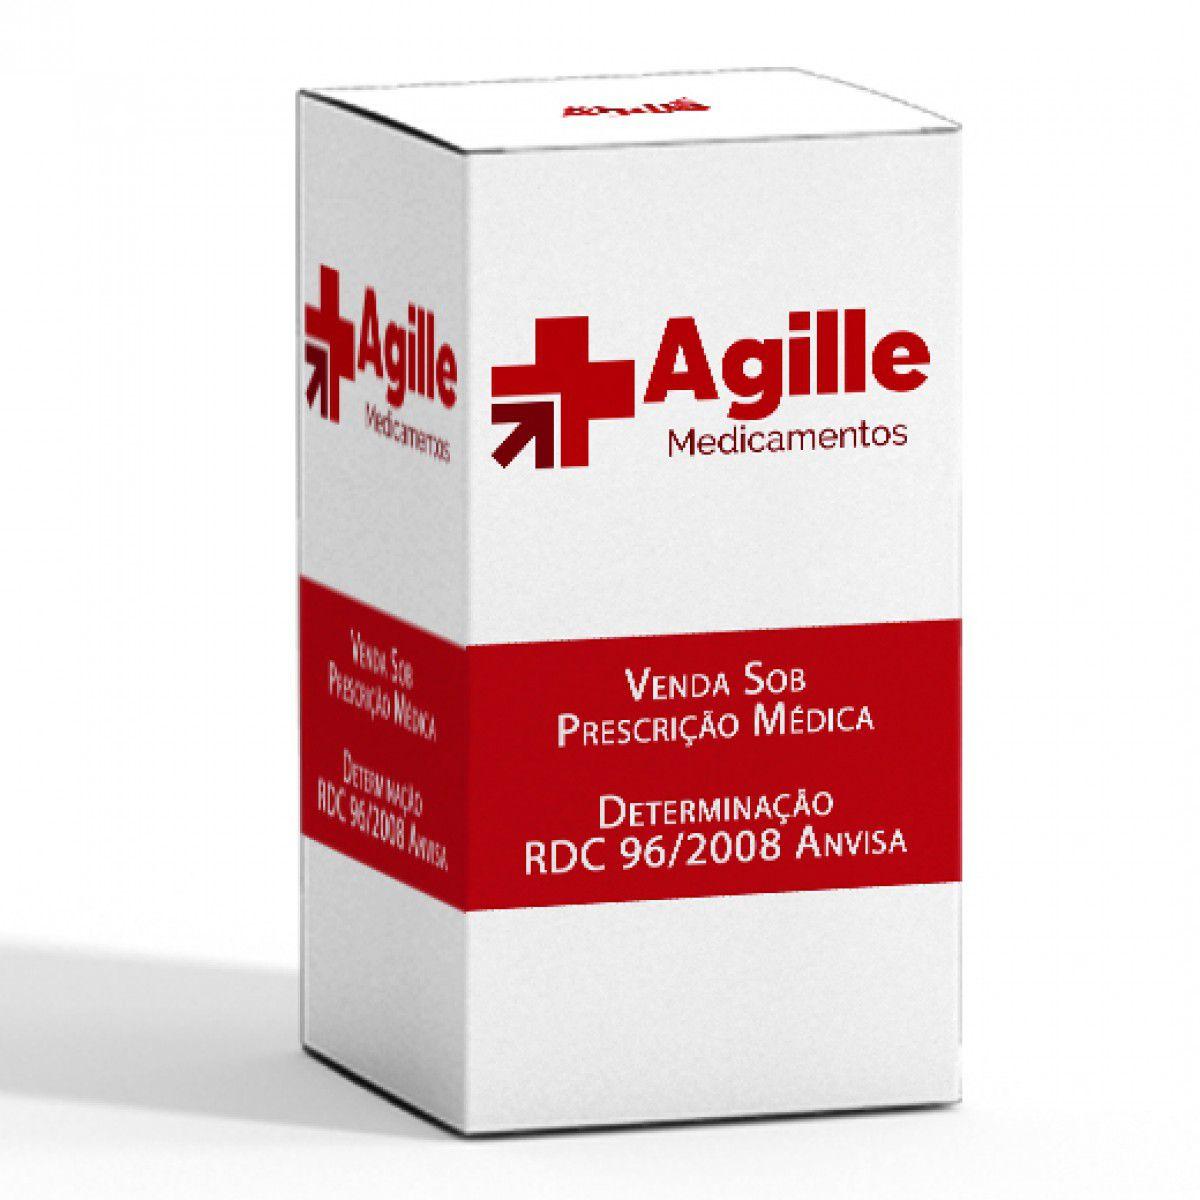 HUMIRA 40mg inj 2ser x 0,8ml+lenco  - Agille Speciality